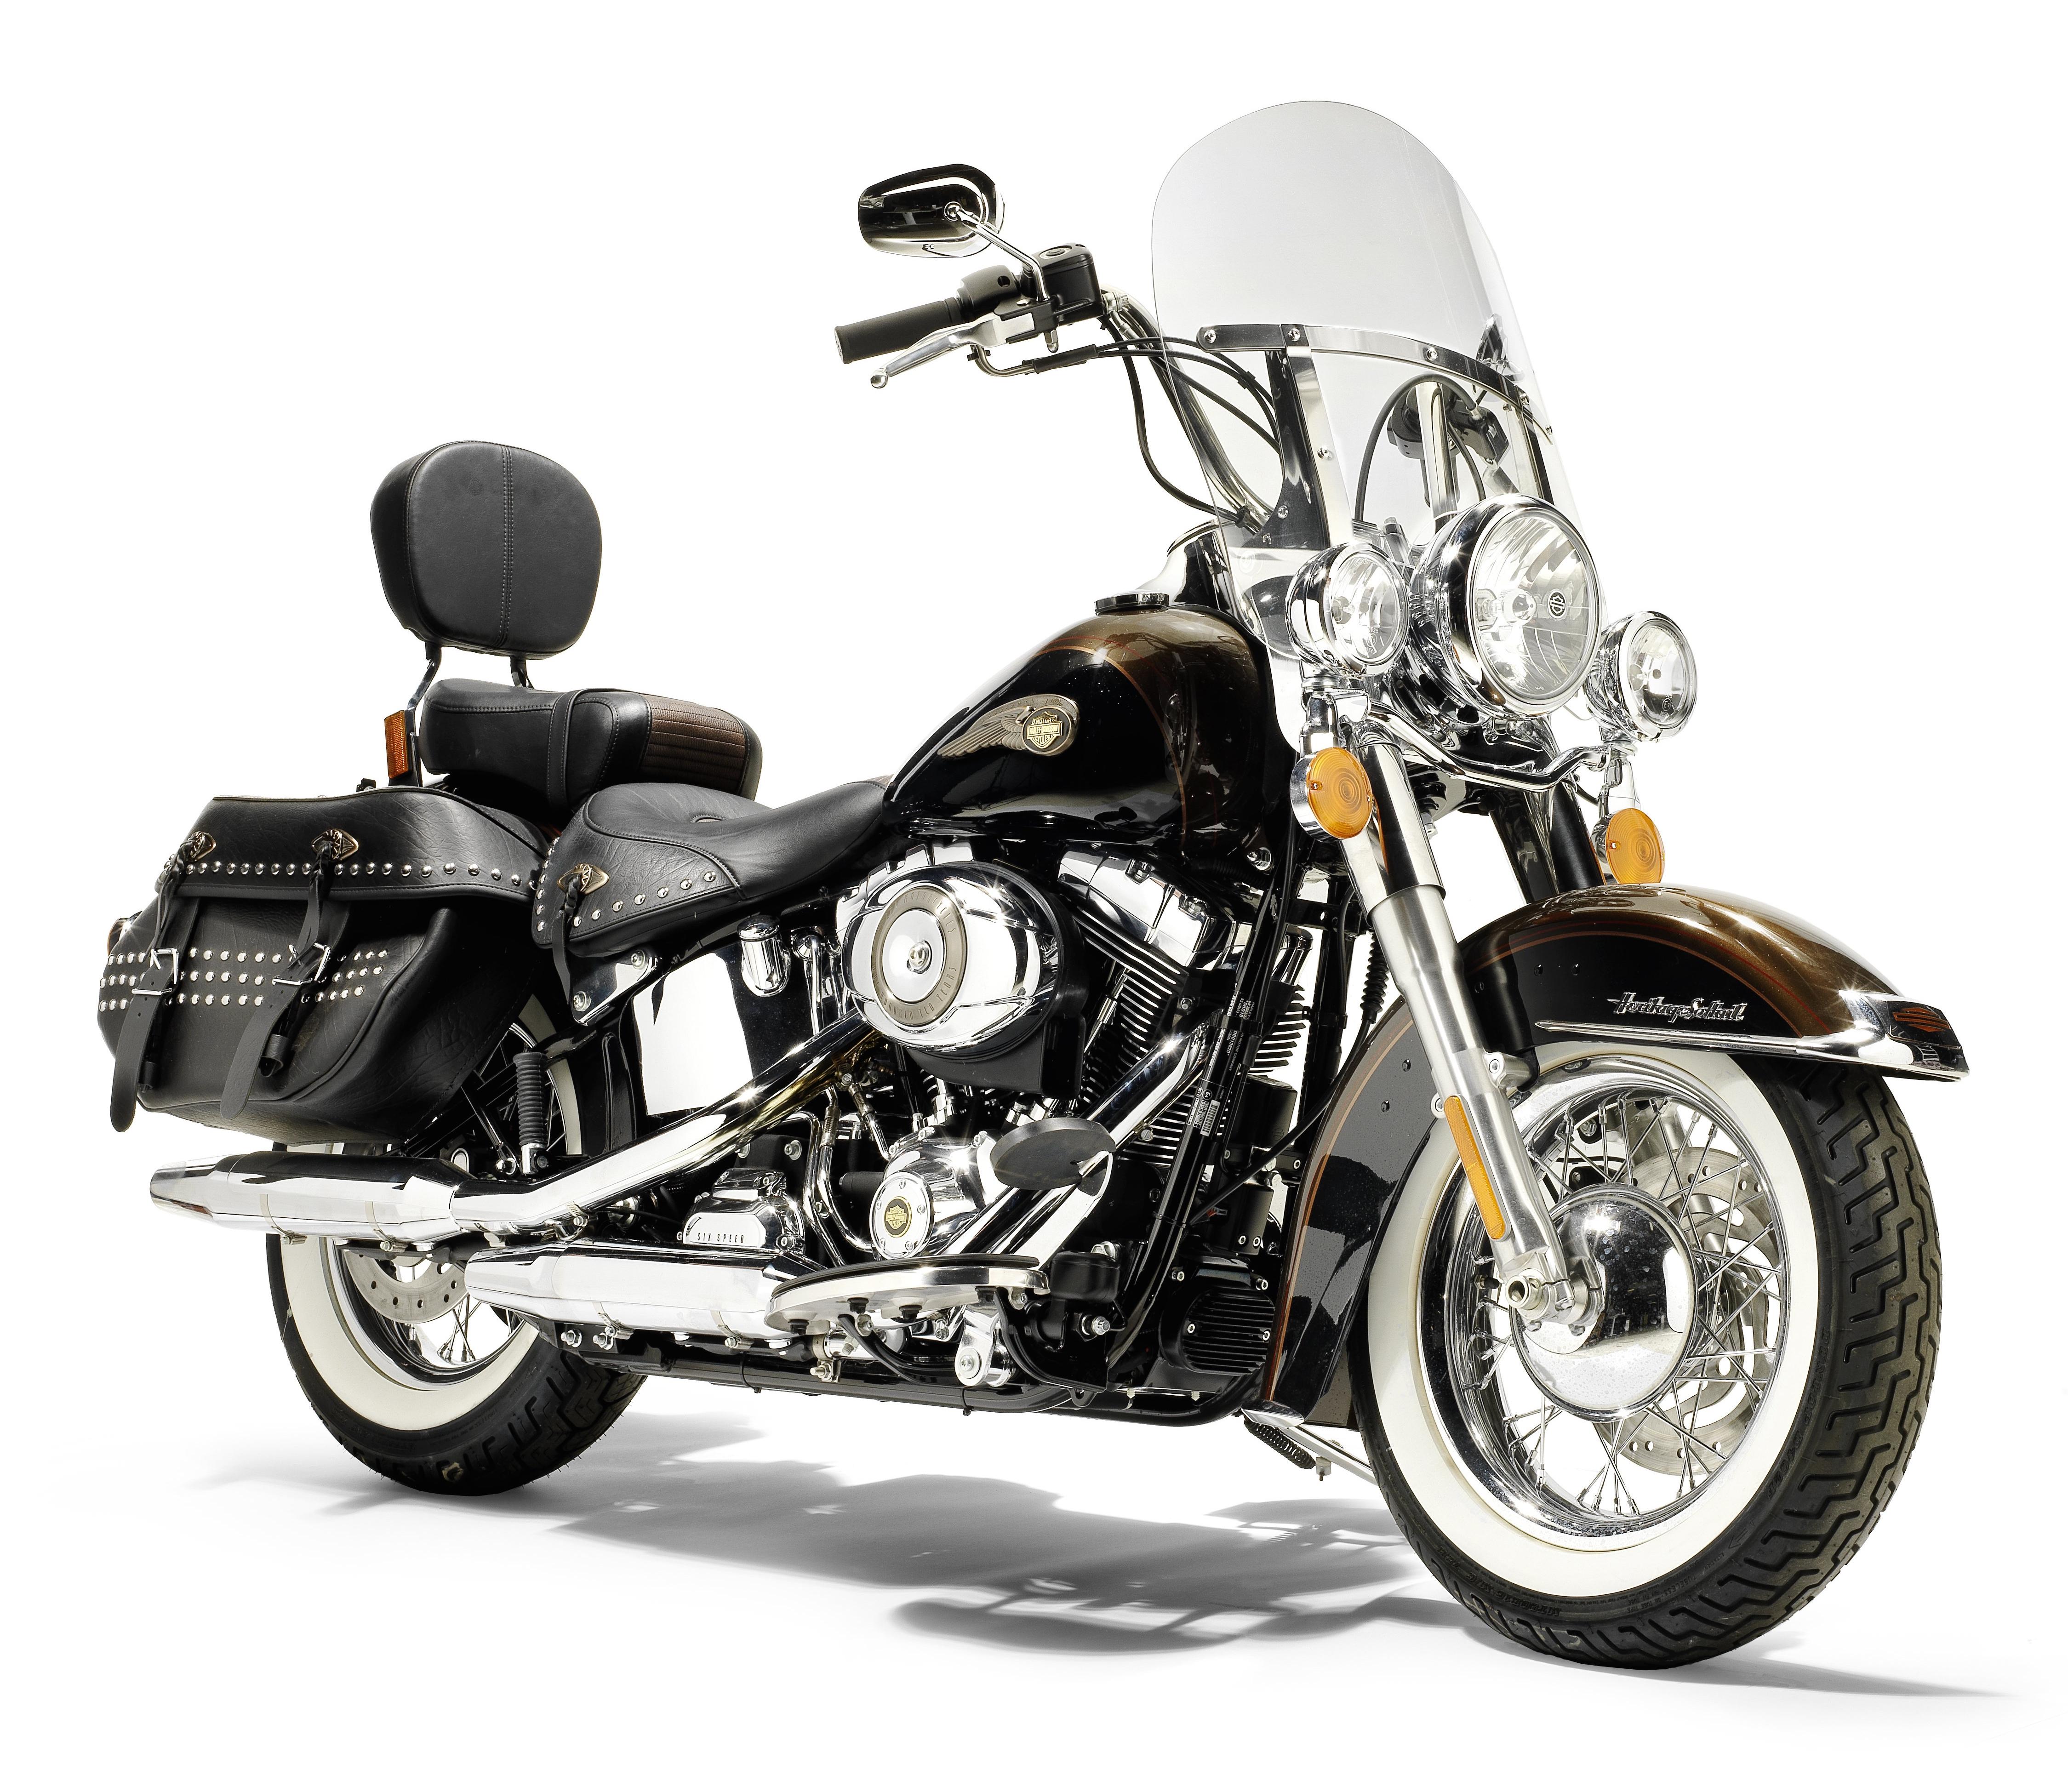 Pope's Harley Davidson 1,690cc FLSTC 103 Heritage Softail Clic ...